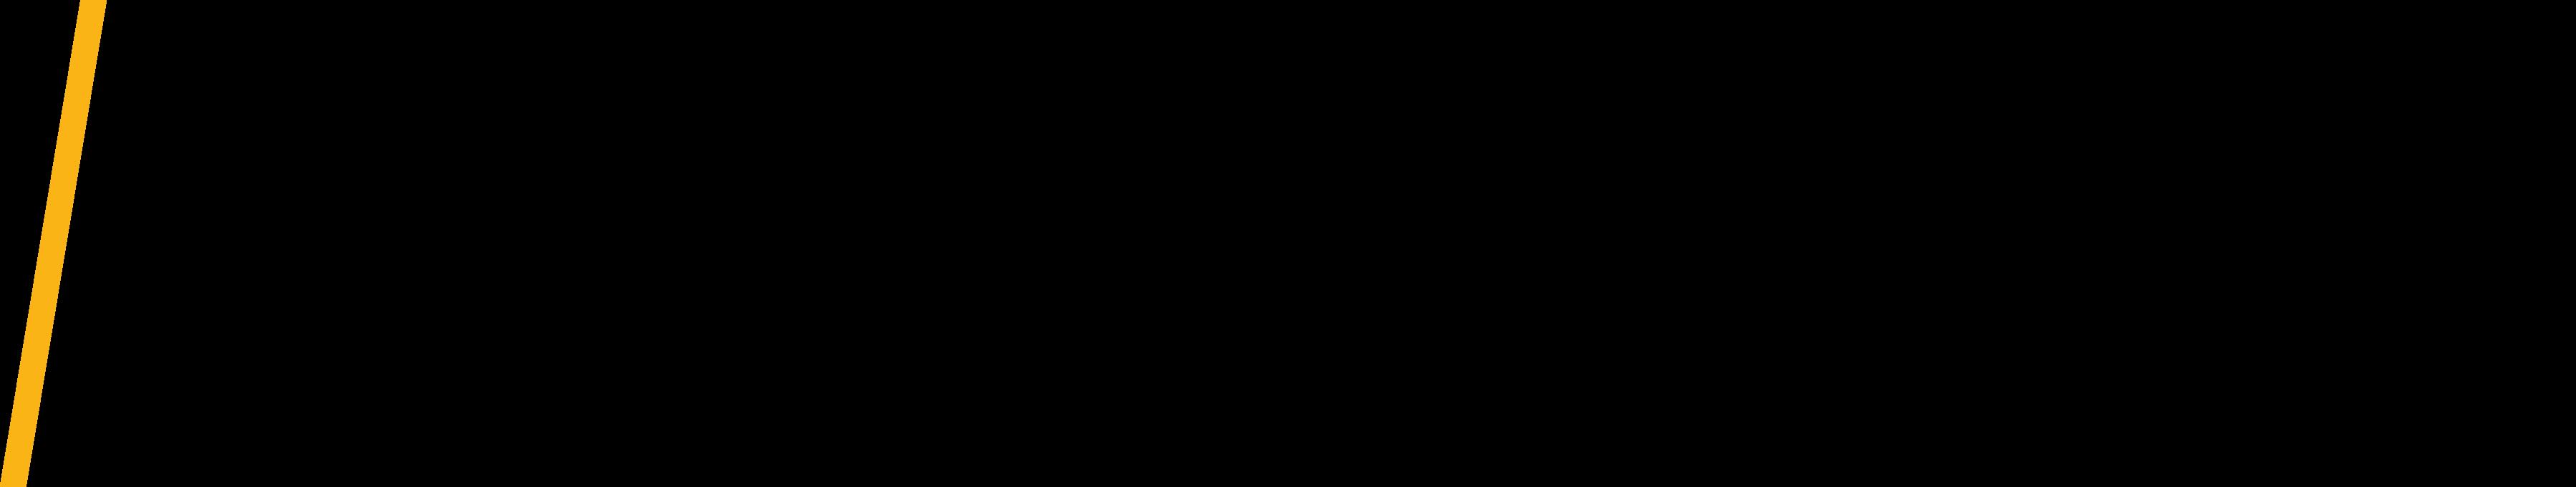 Partners + Napier Inc. Company Logo